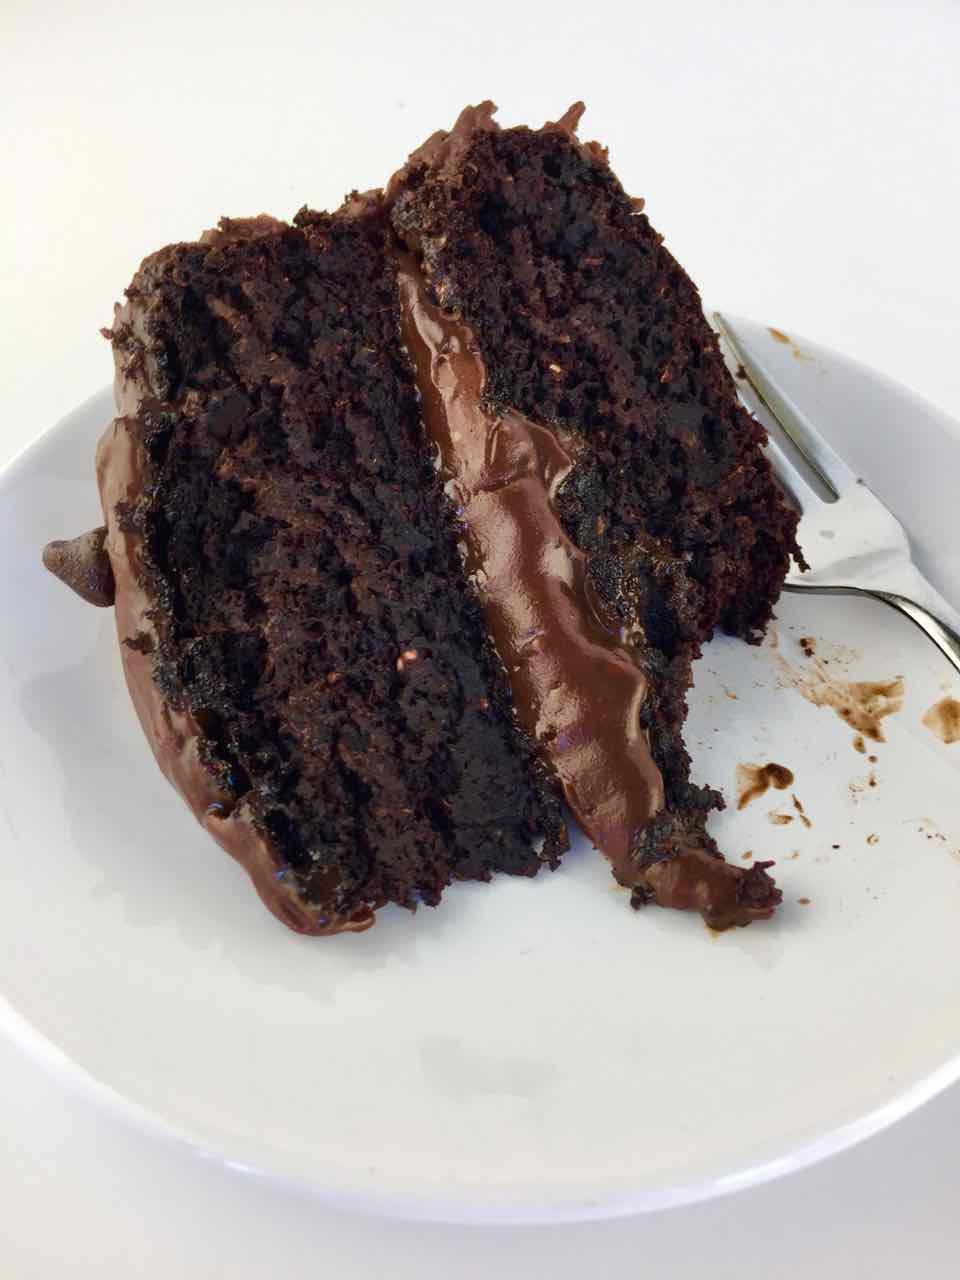 Healthy Aqua Faba Vegan Chocolate Birthday Cake Fat Free